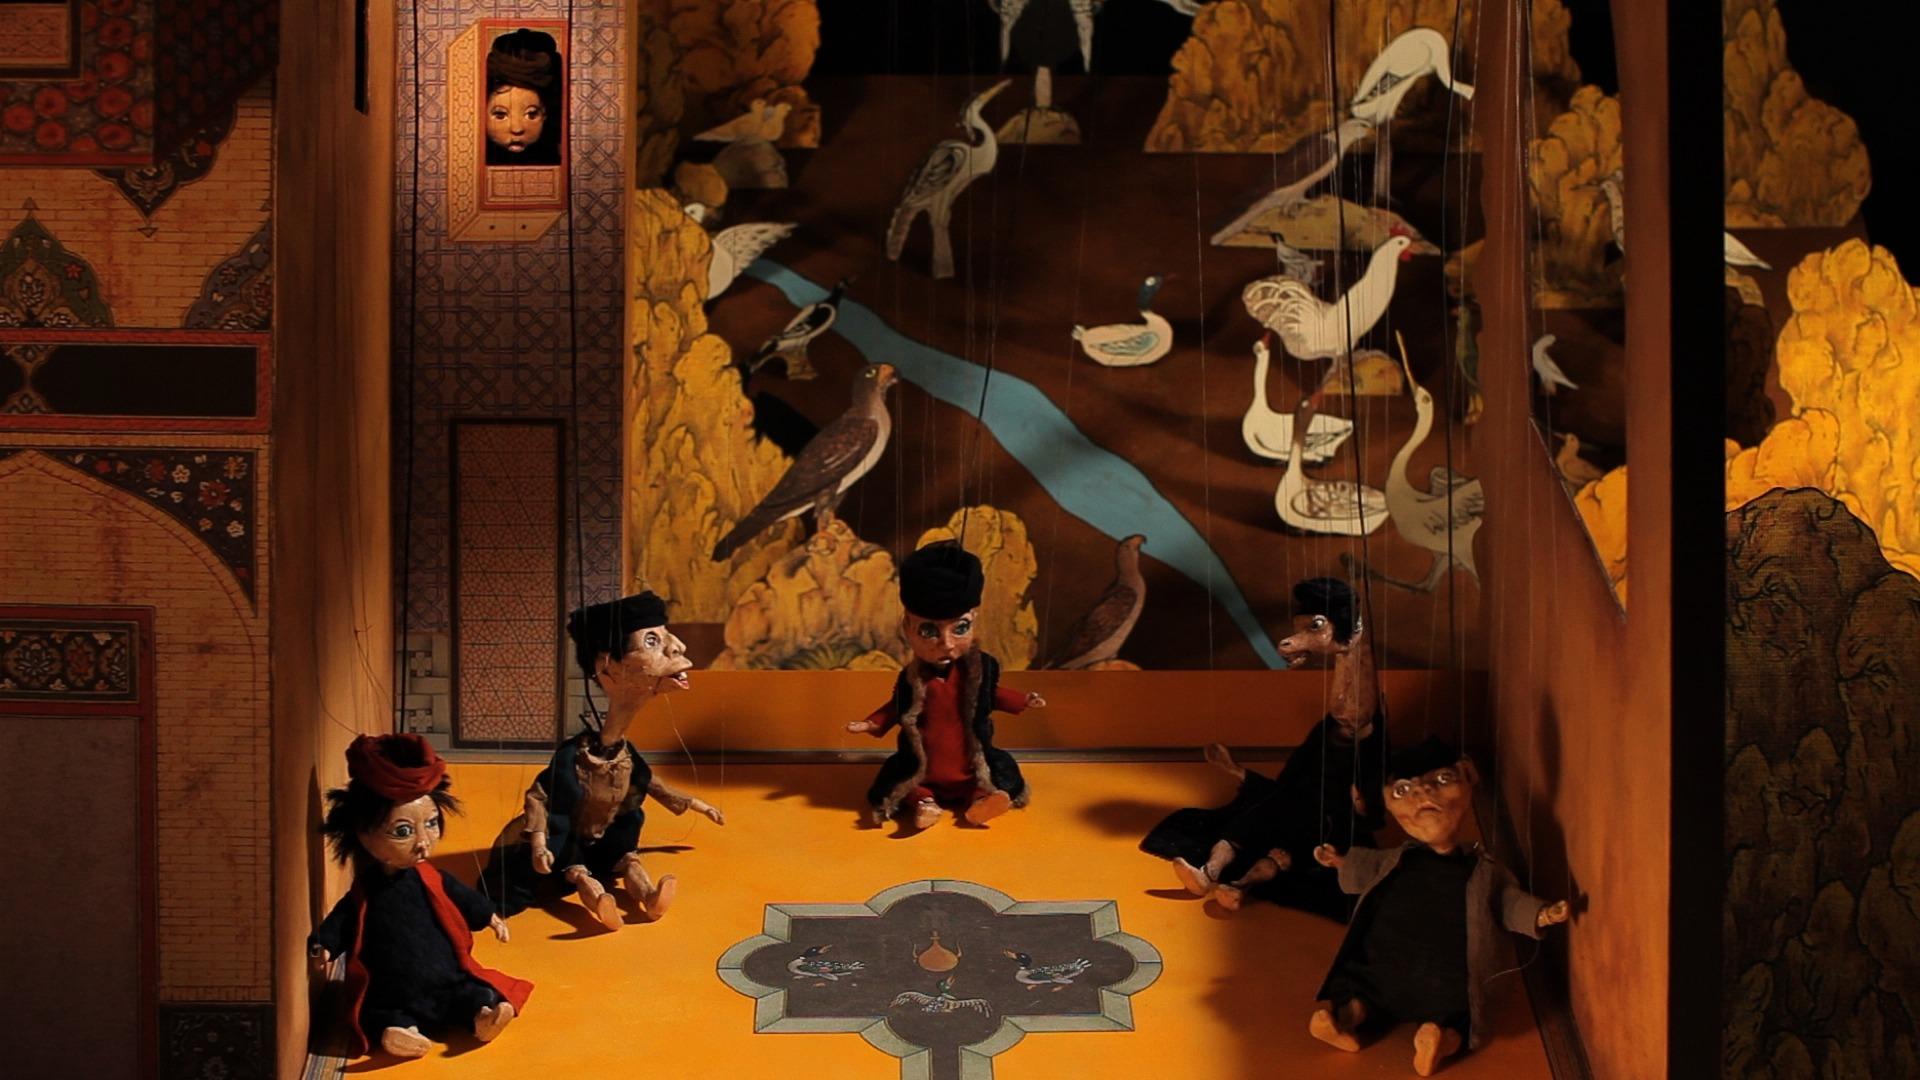 Cabaret Crusades: The Path to Cairo@(capture d'écran)